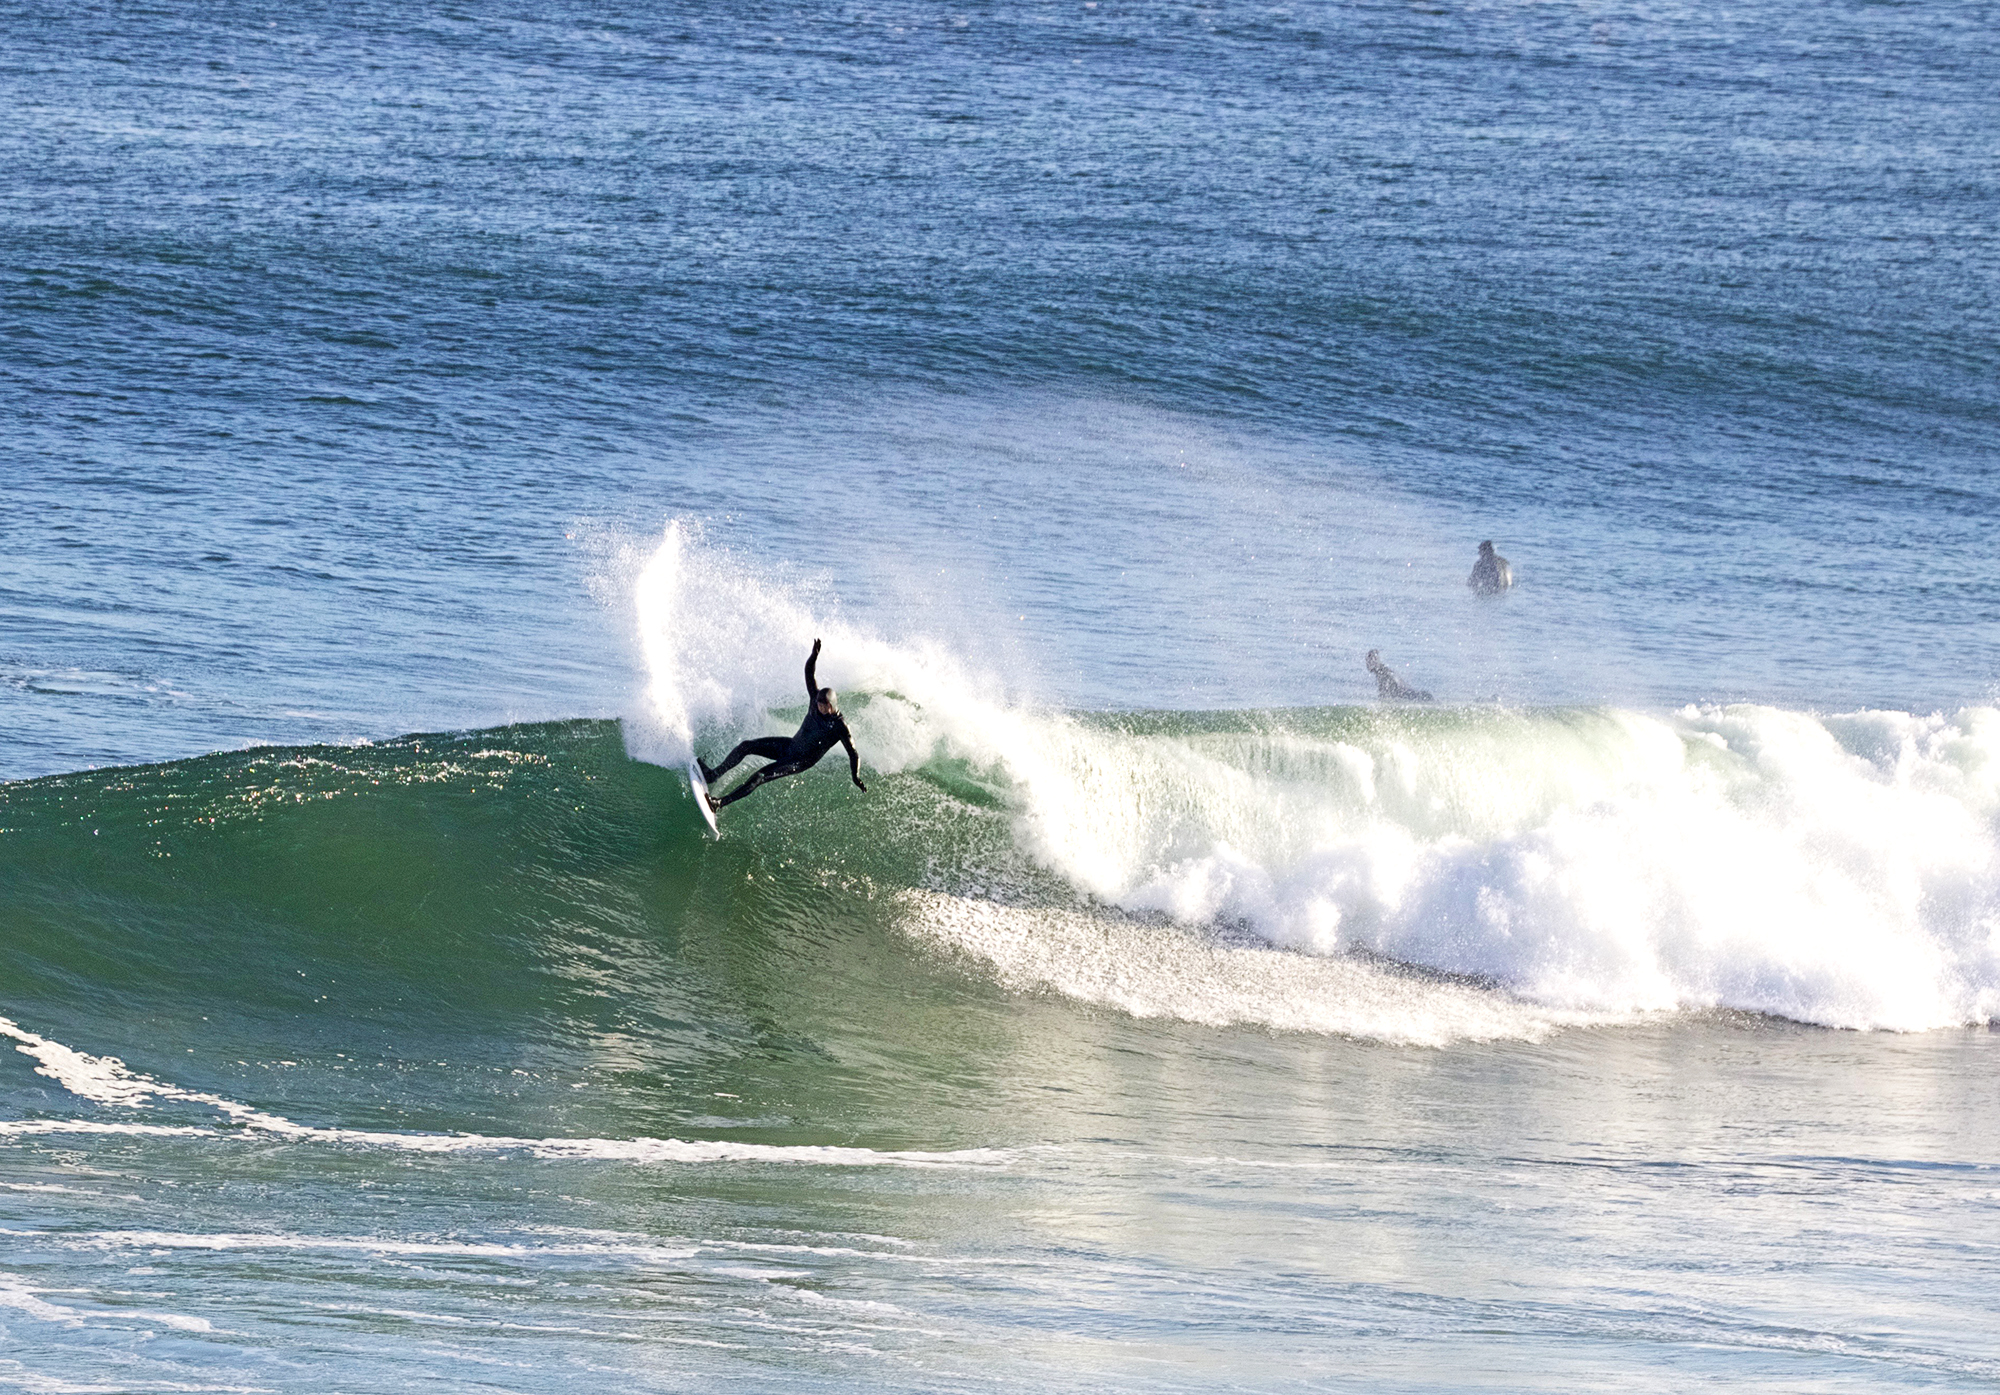 1-19-17 MTK Surfer 24.jpg